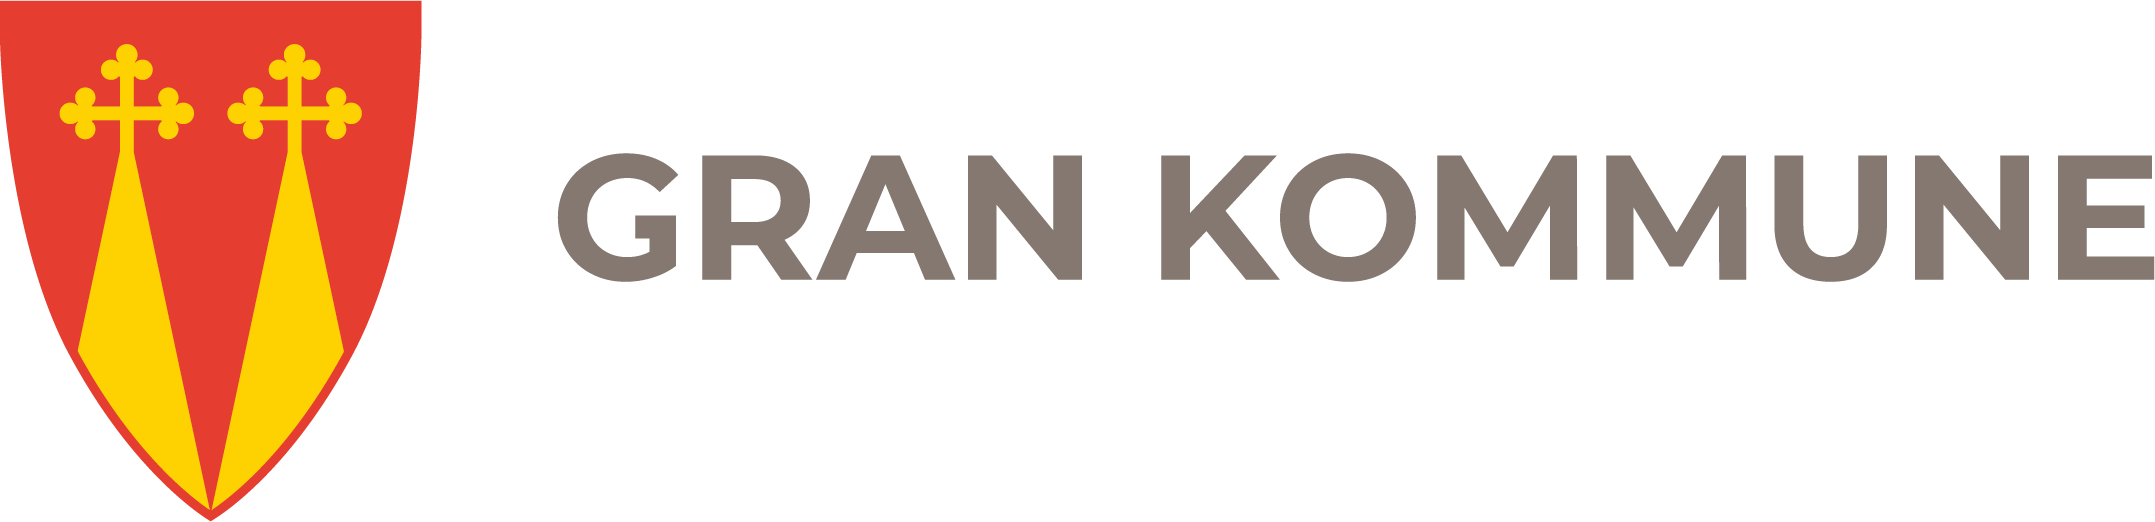 Gran kommune logo